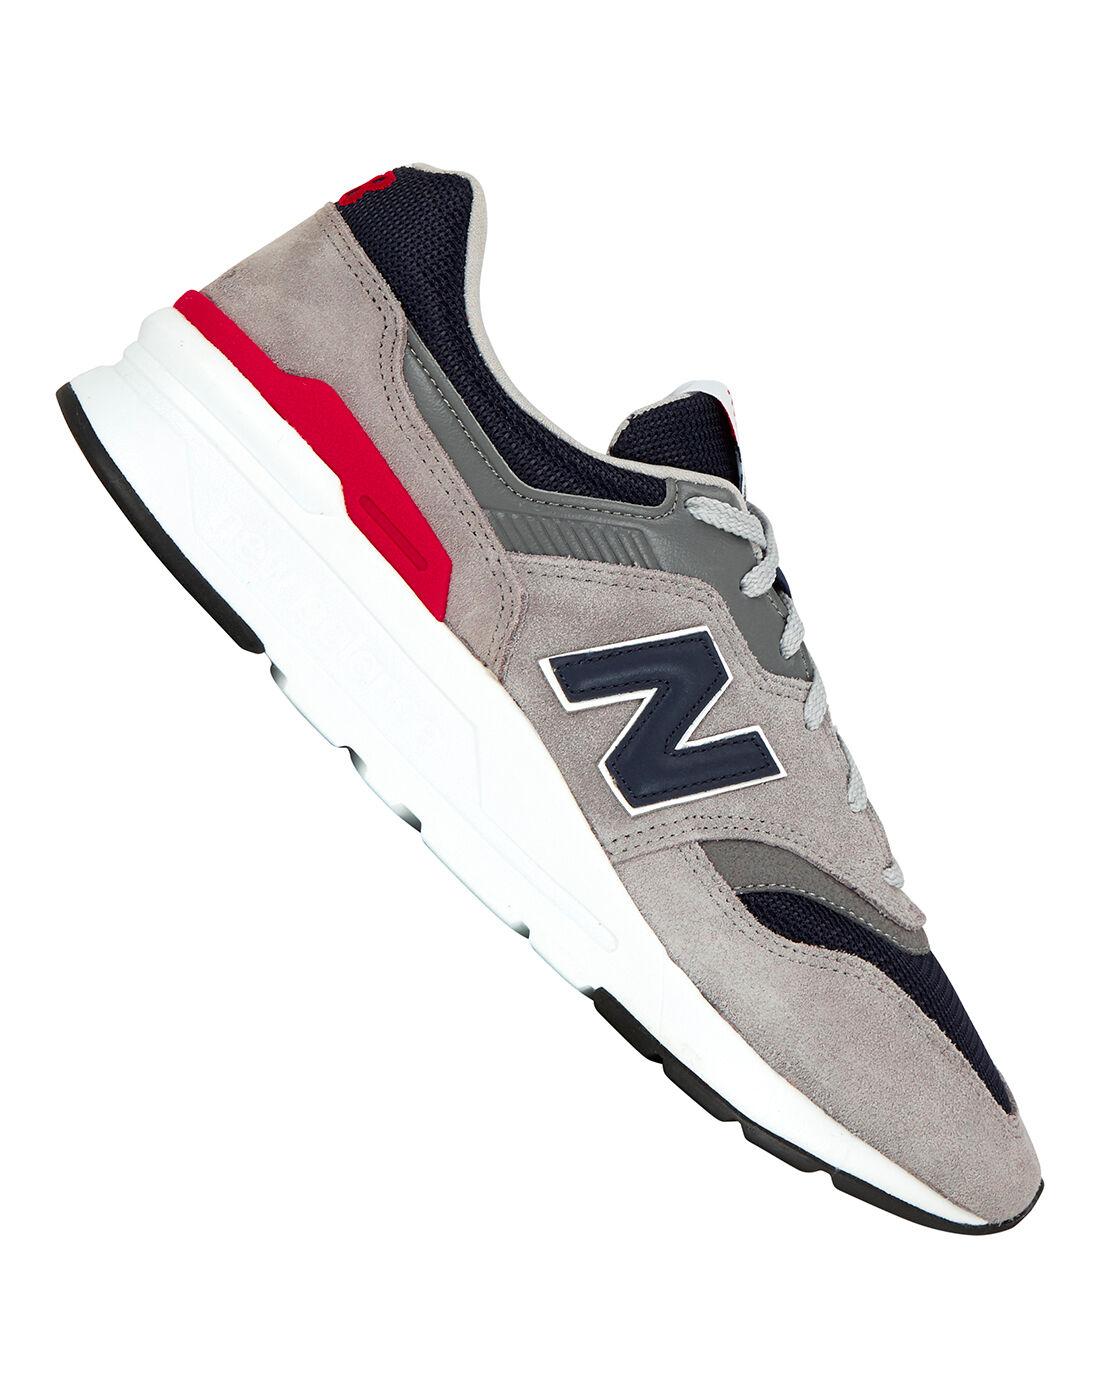 Grey \u0026 Navy New Balance 997 Trainer